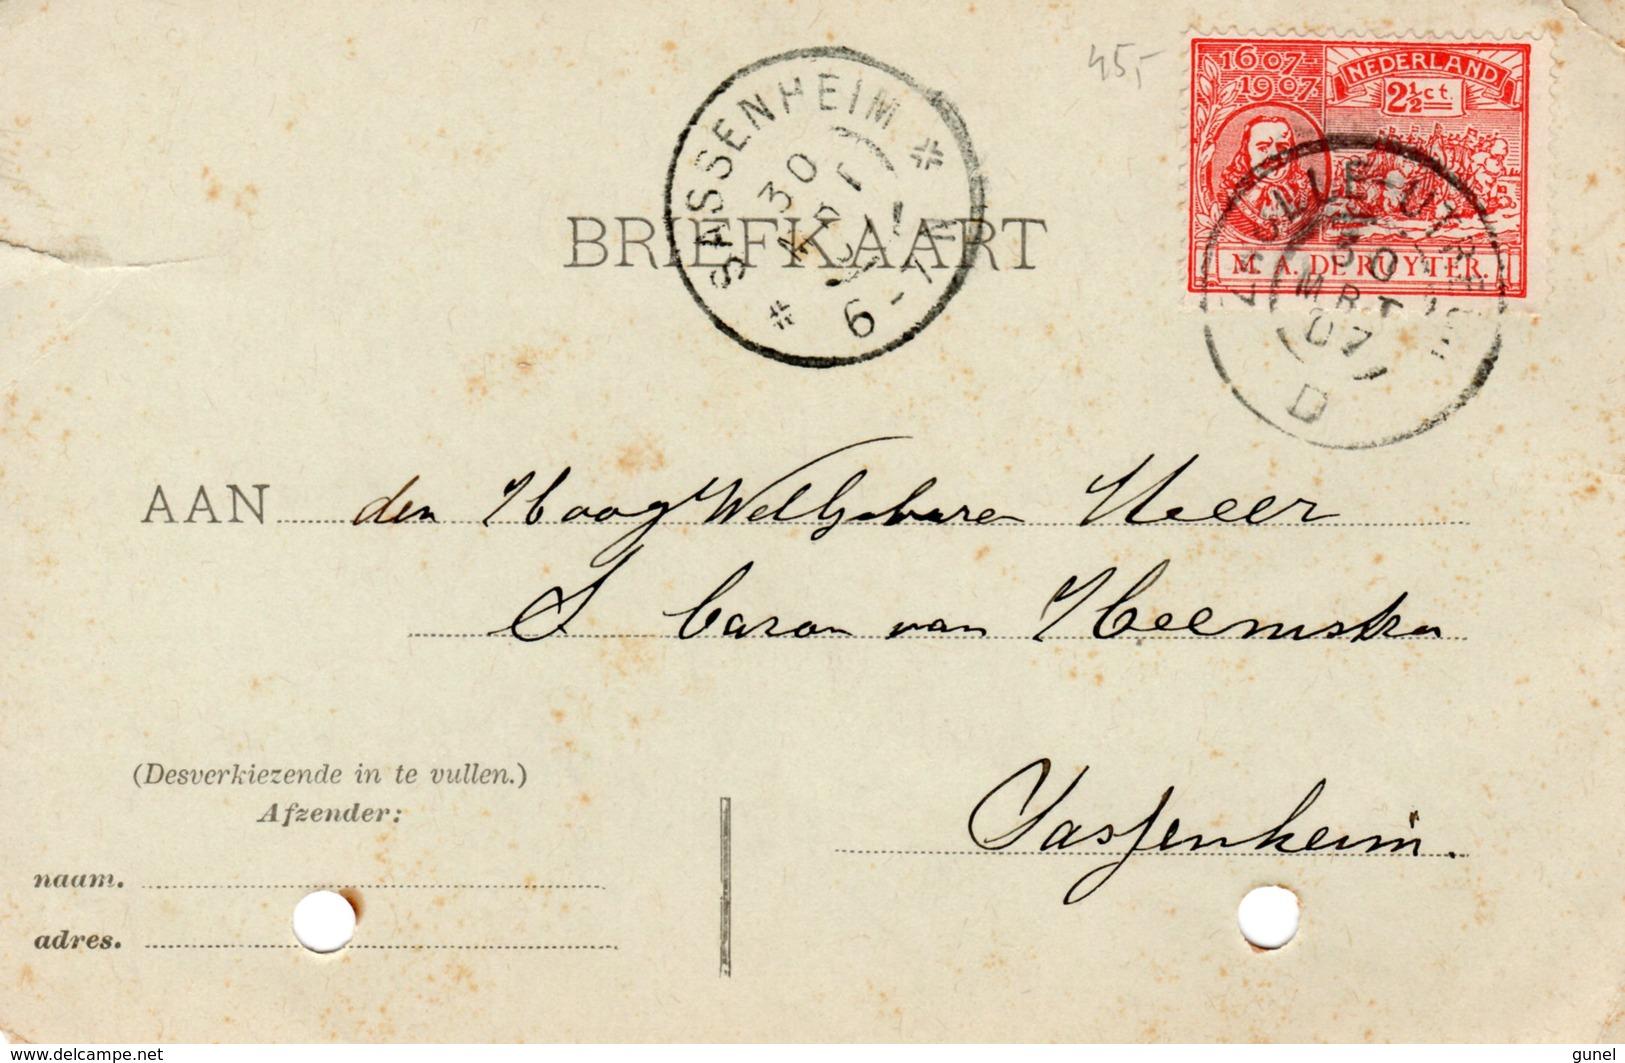 30 MRT 07 Gr.rond ZWOLLE-UTRECHT D  Op NVPH89 Op Corr.kaart Naar Sassenheim (perforatiegaatjes) - Periode 1891-1948 (Wilhelmina)